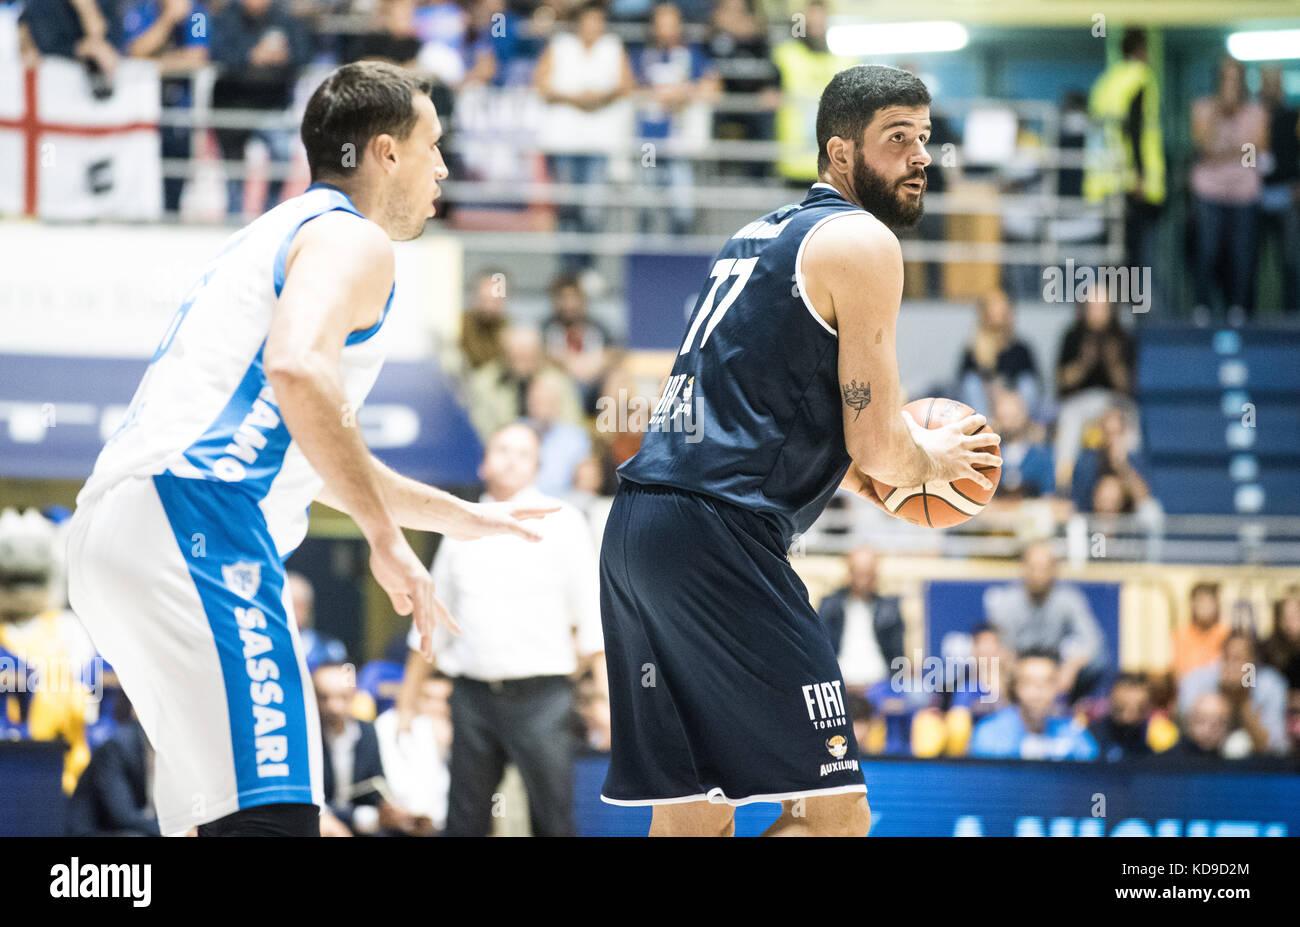 Antonio Iannuzzi Turin, Italy 7th october 2017. Serie A an Basketball match Fiat Torino Auxilium vs Dinamo Sassari Stock Photo